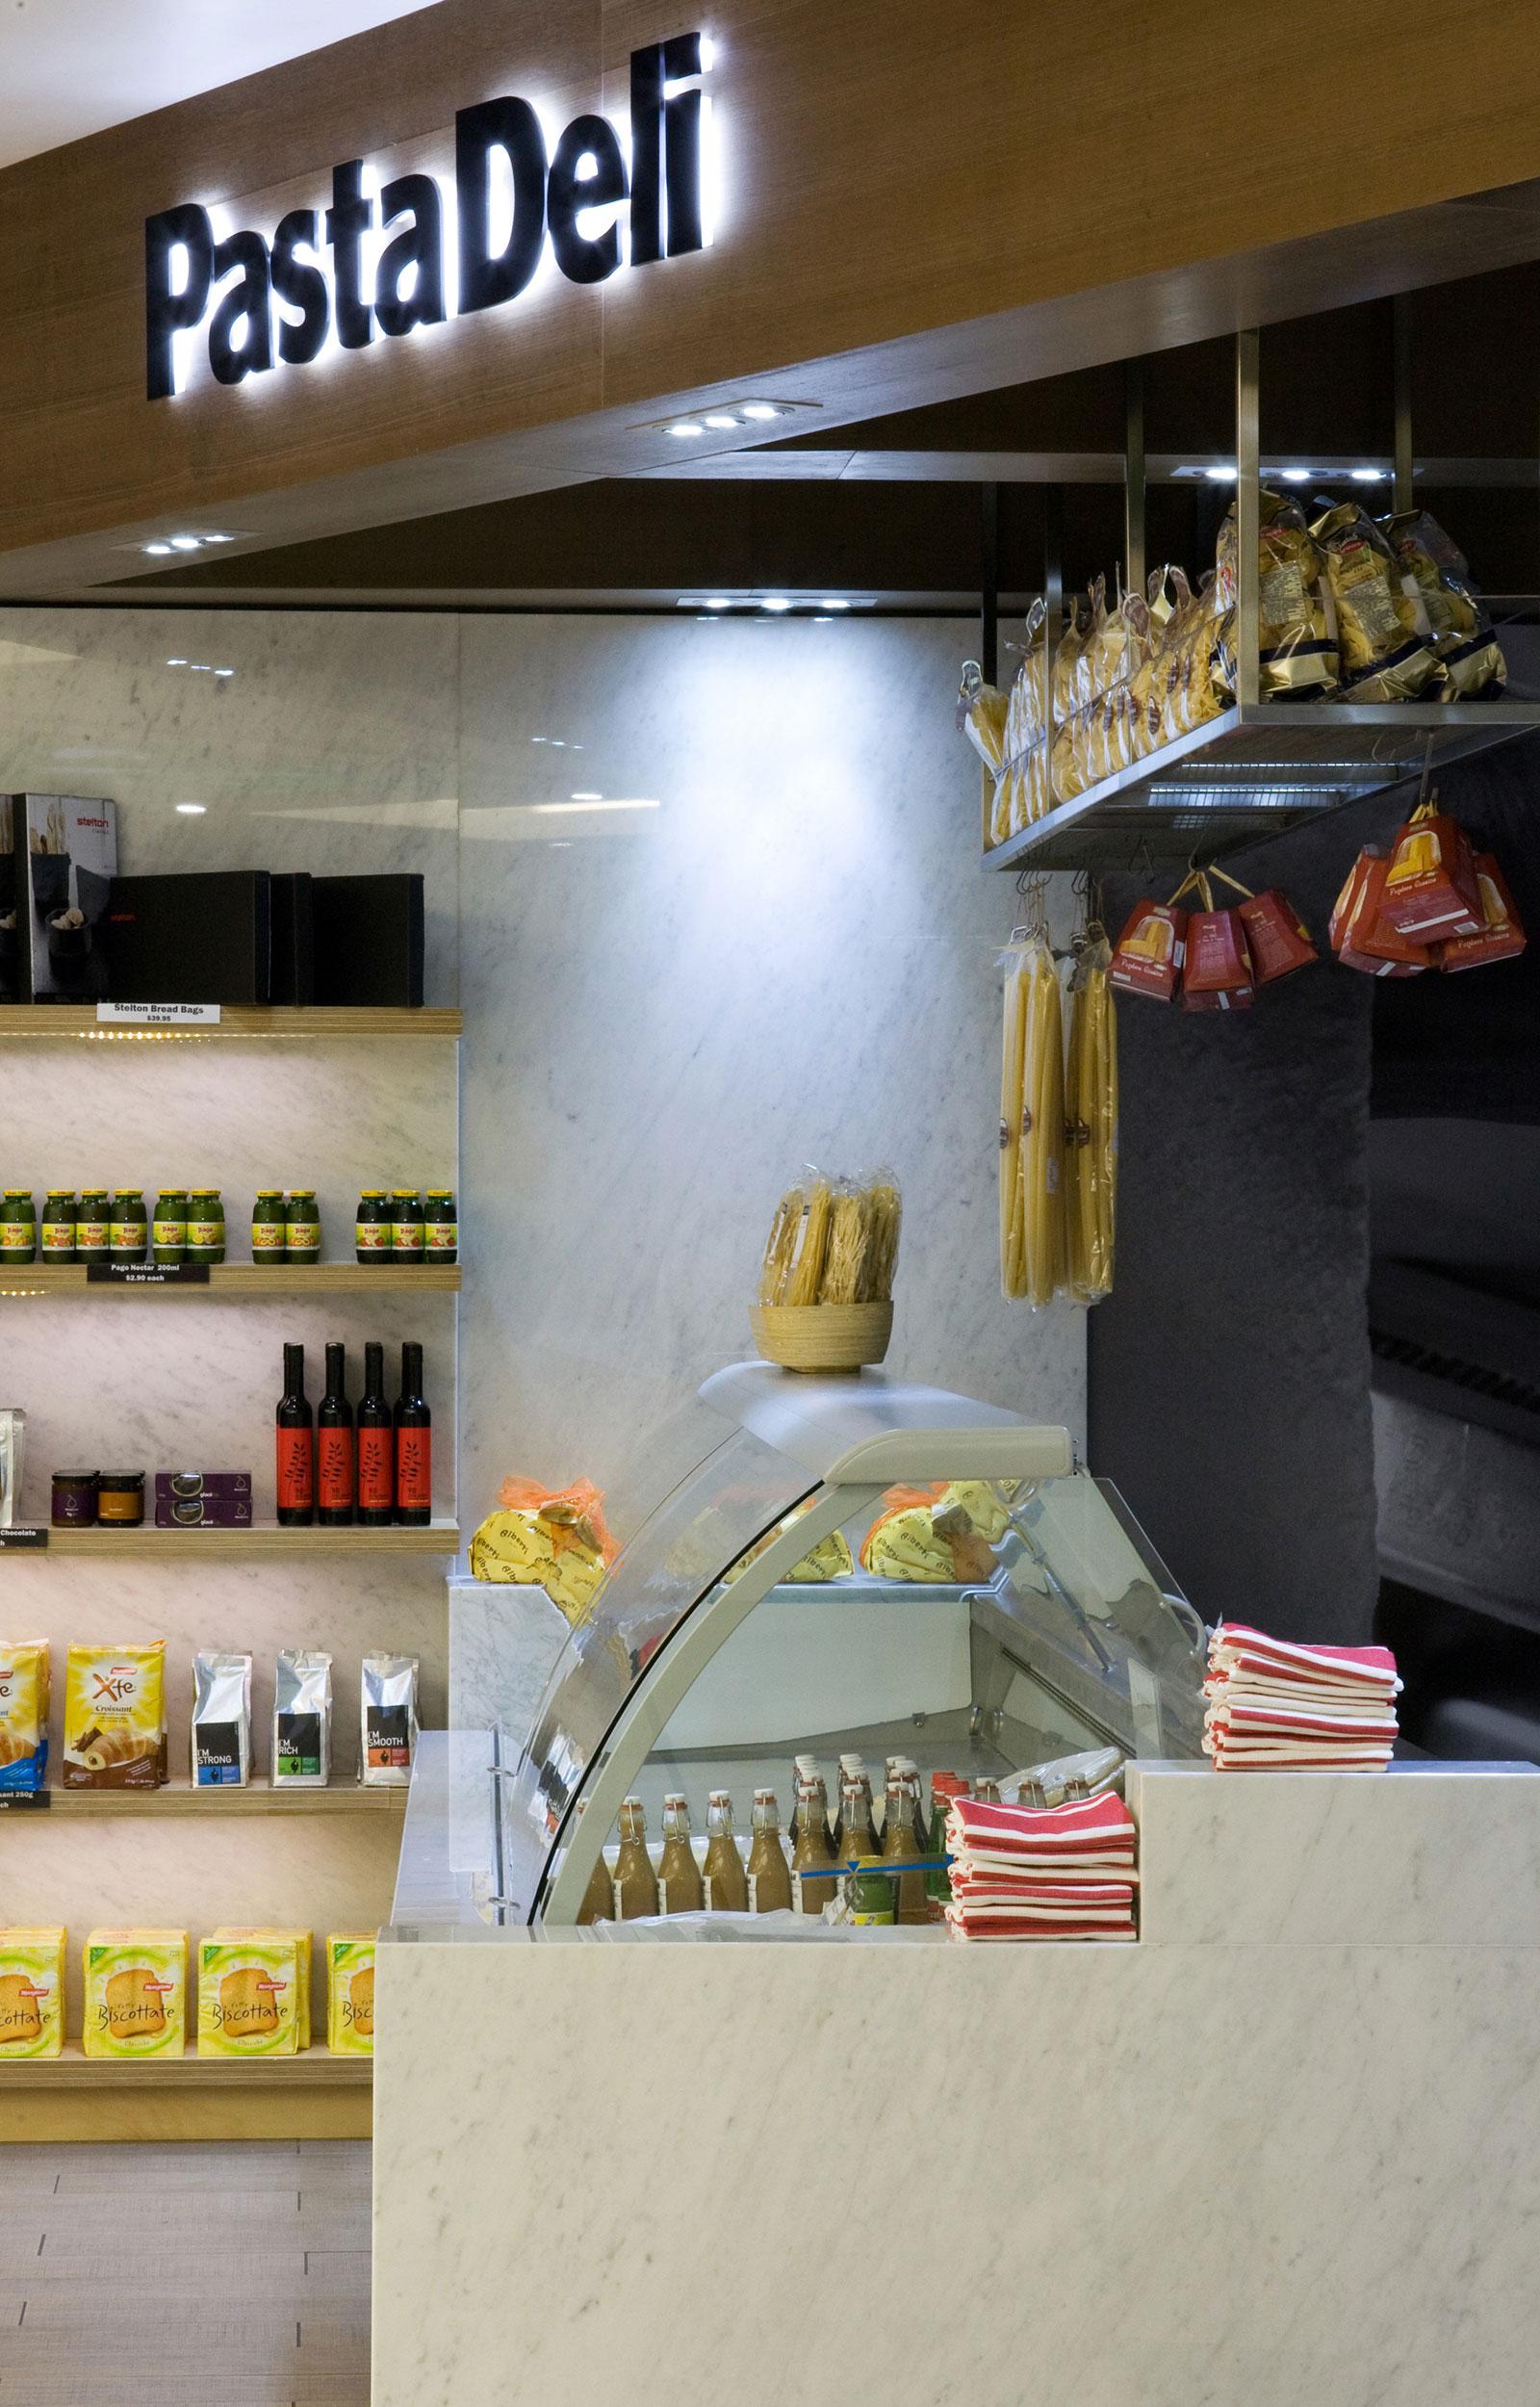 enoki-interior-pastadeli-2.jpg